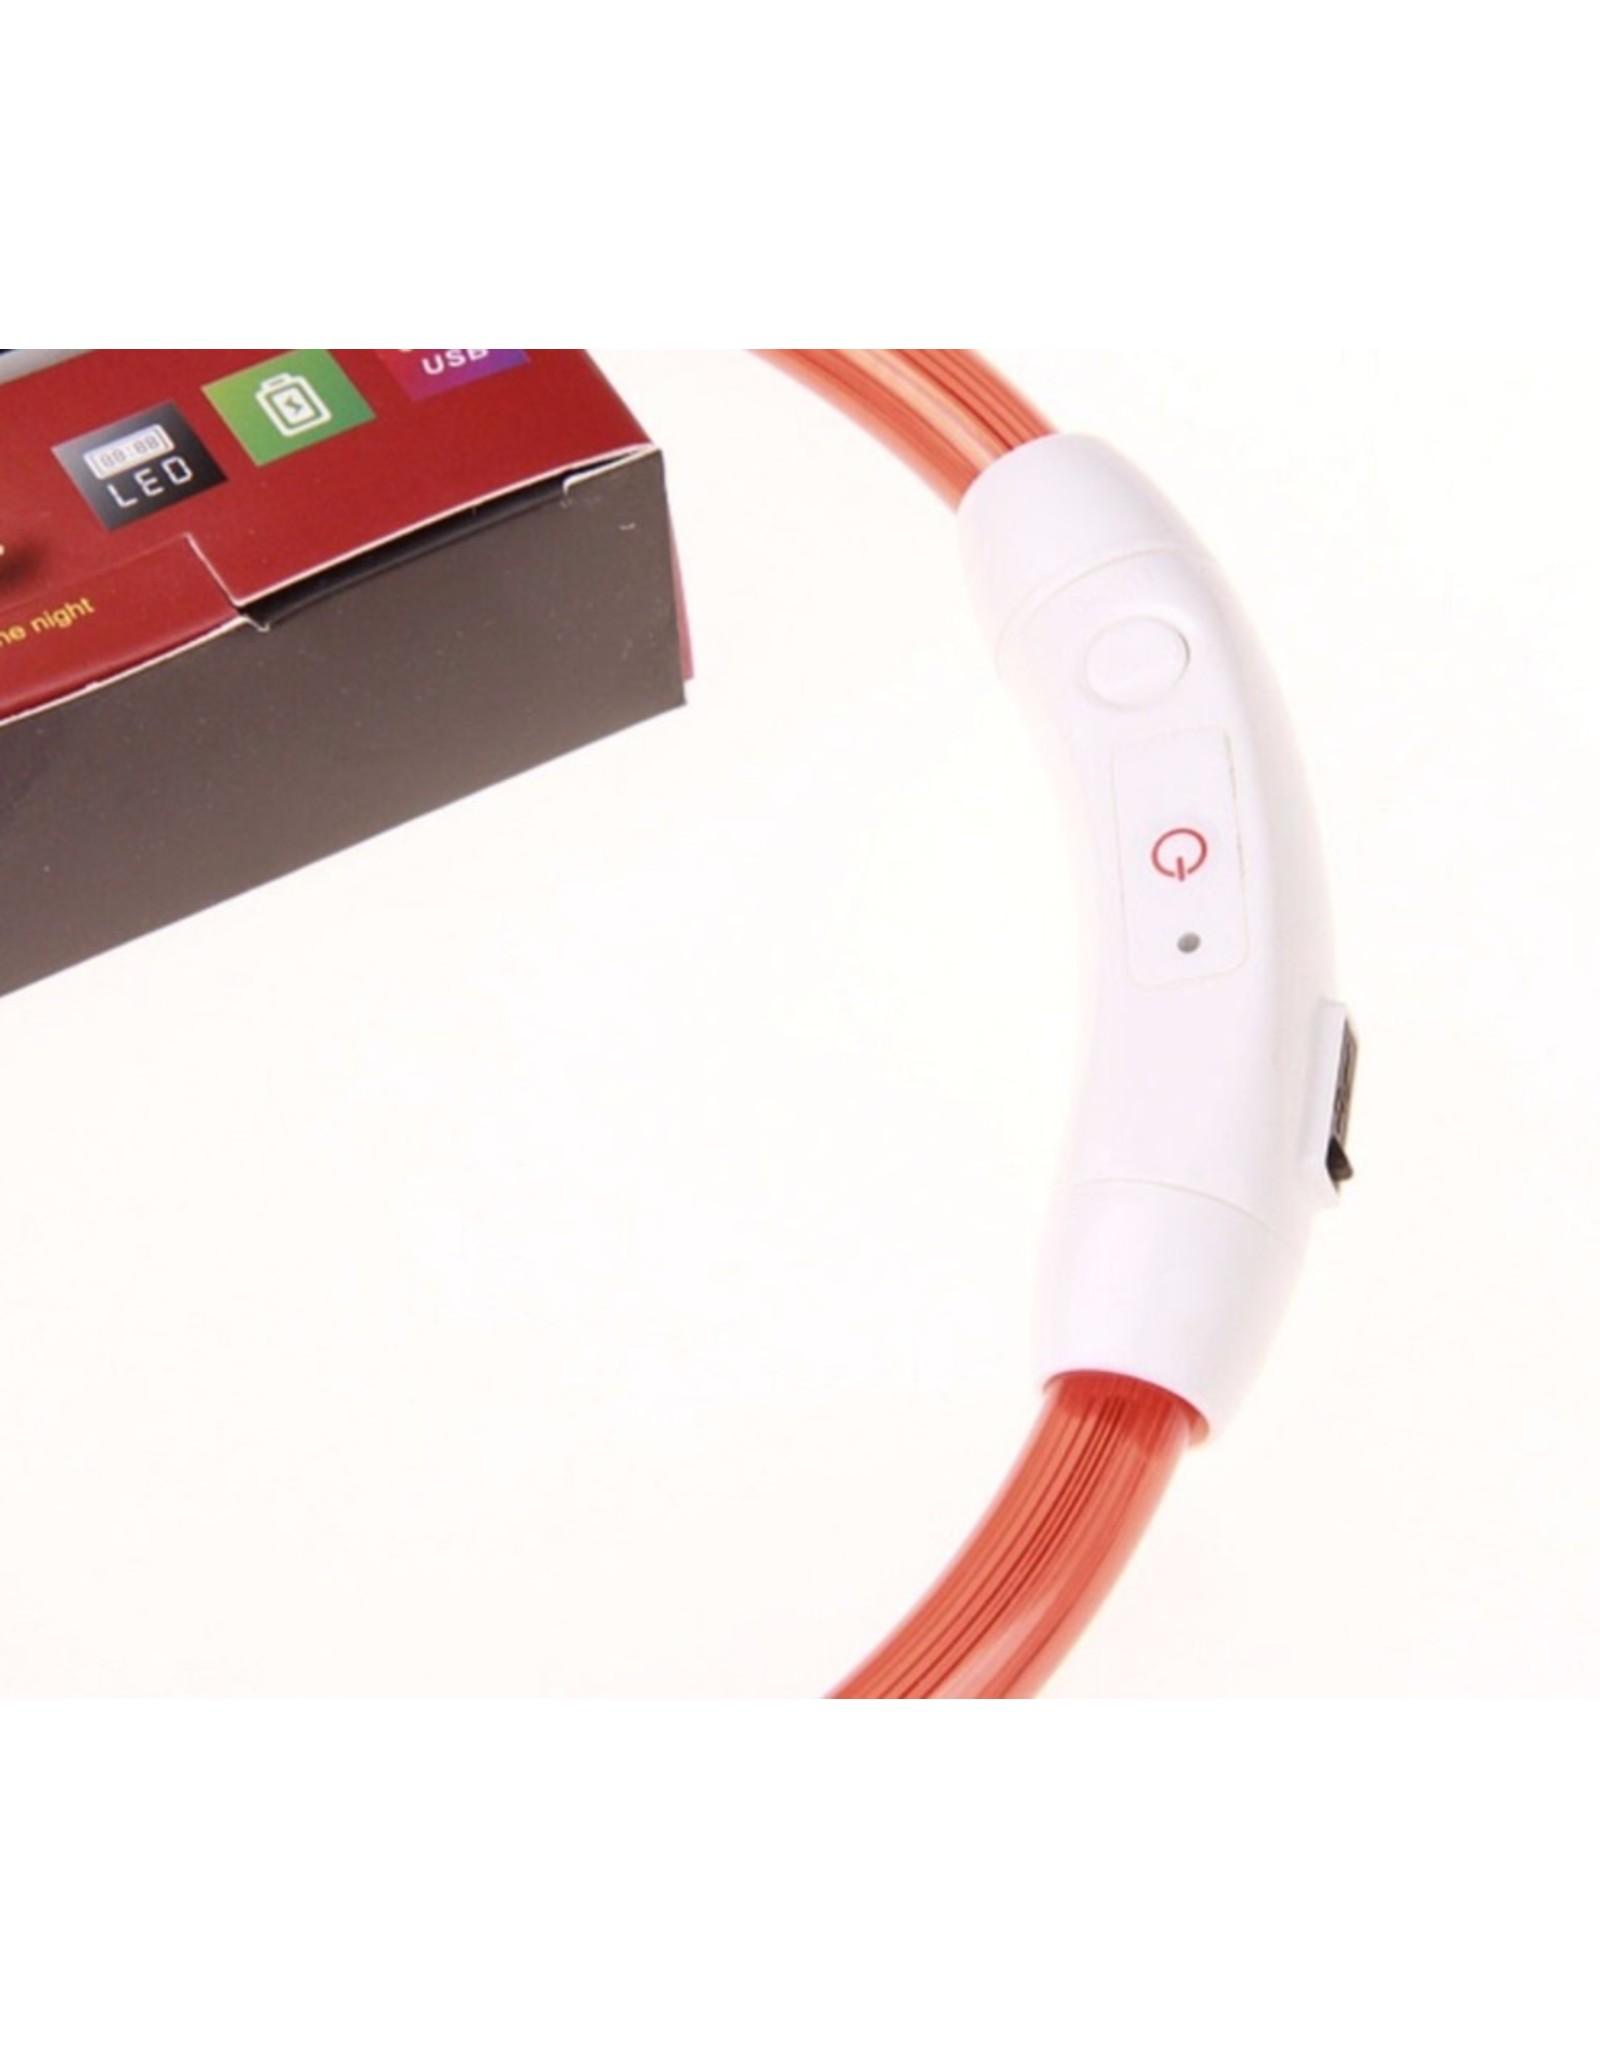 Eenvoudige USB LED Knipperlicht Band - Veiligheid - Hondenhalsband Oplaadbaar Veelkleurig